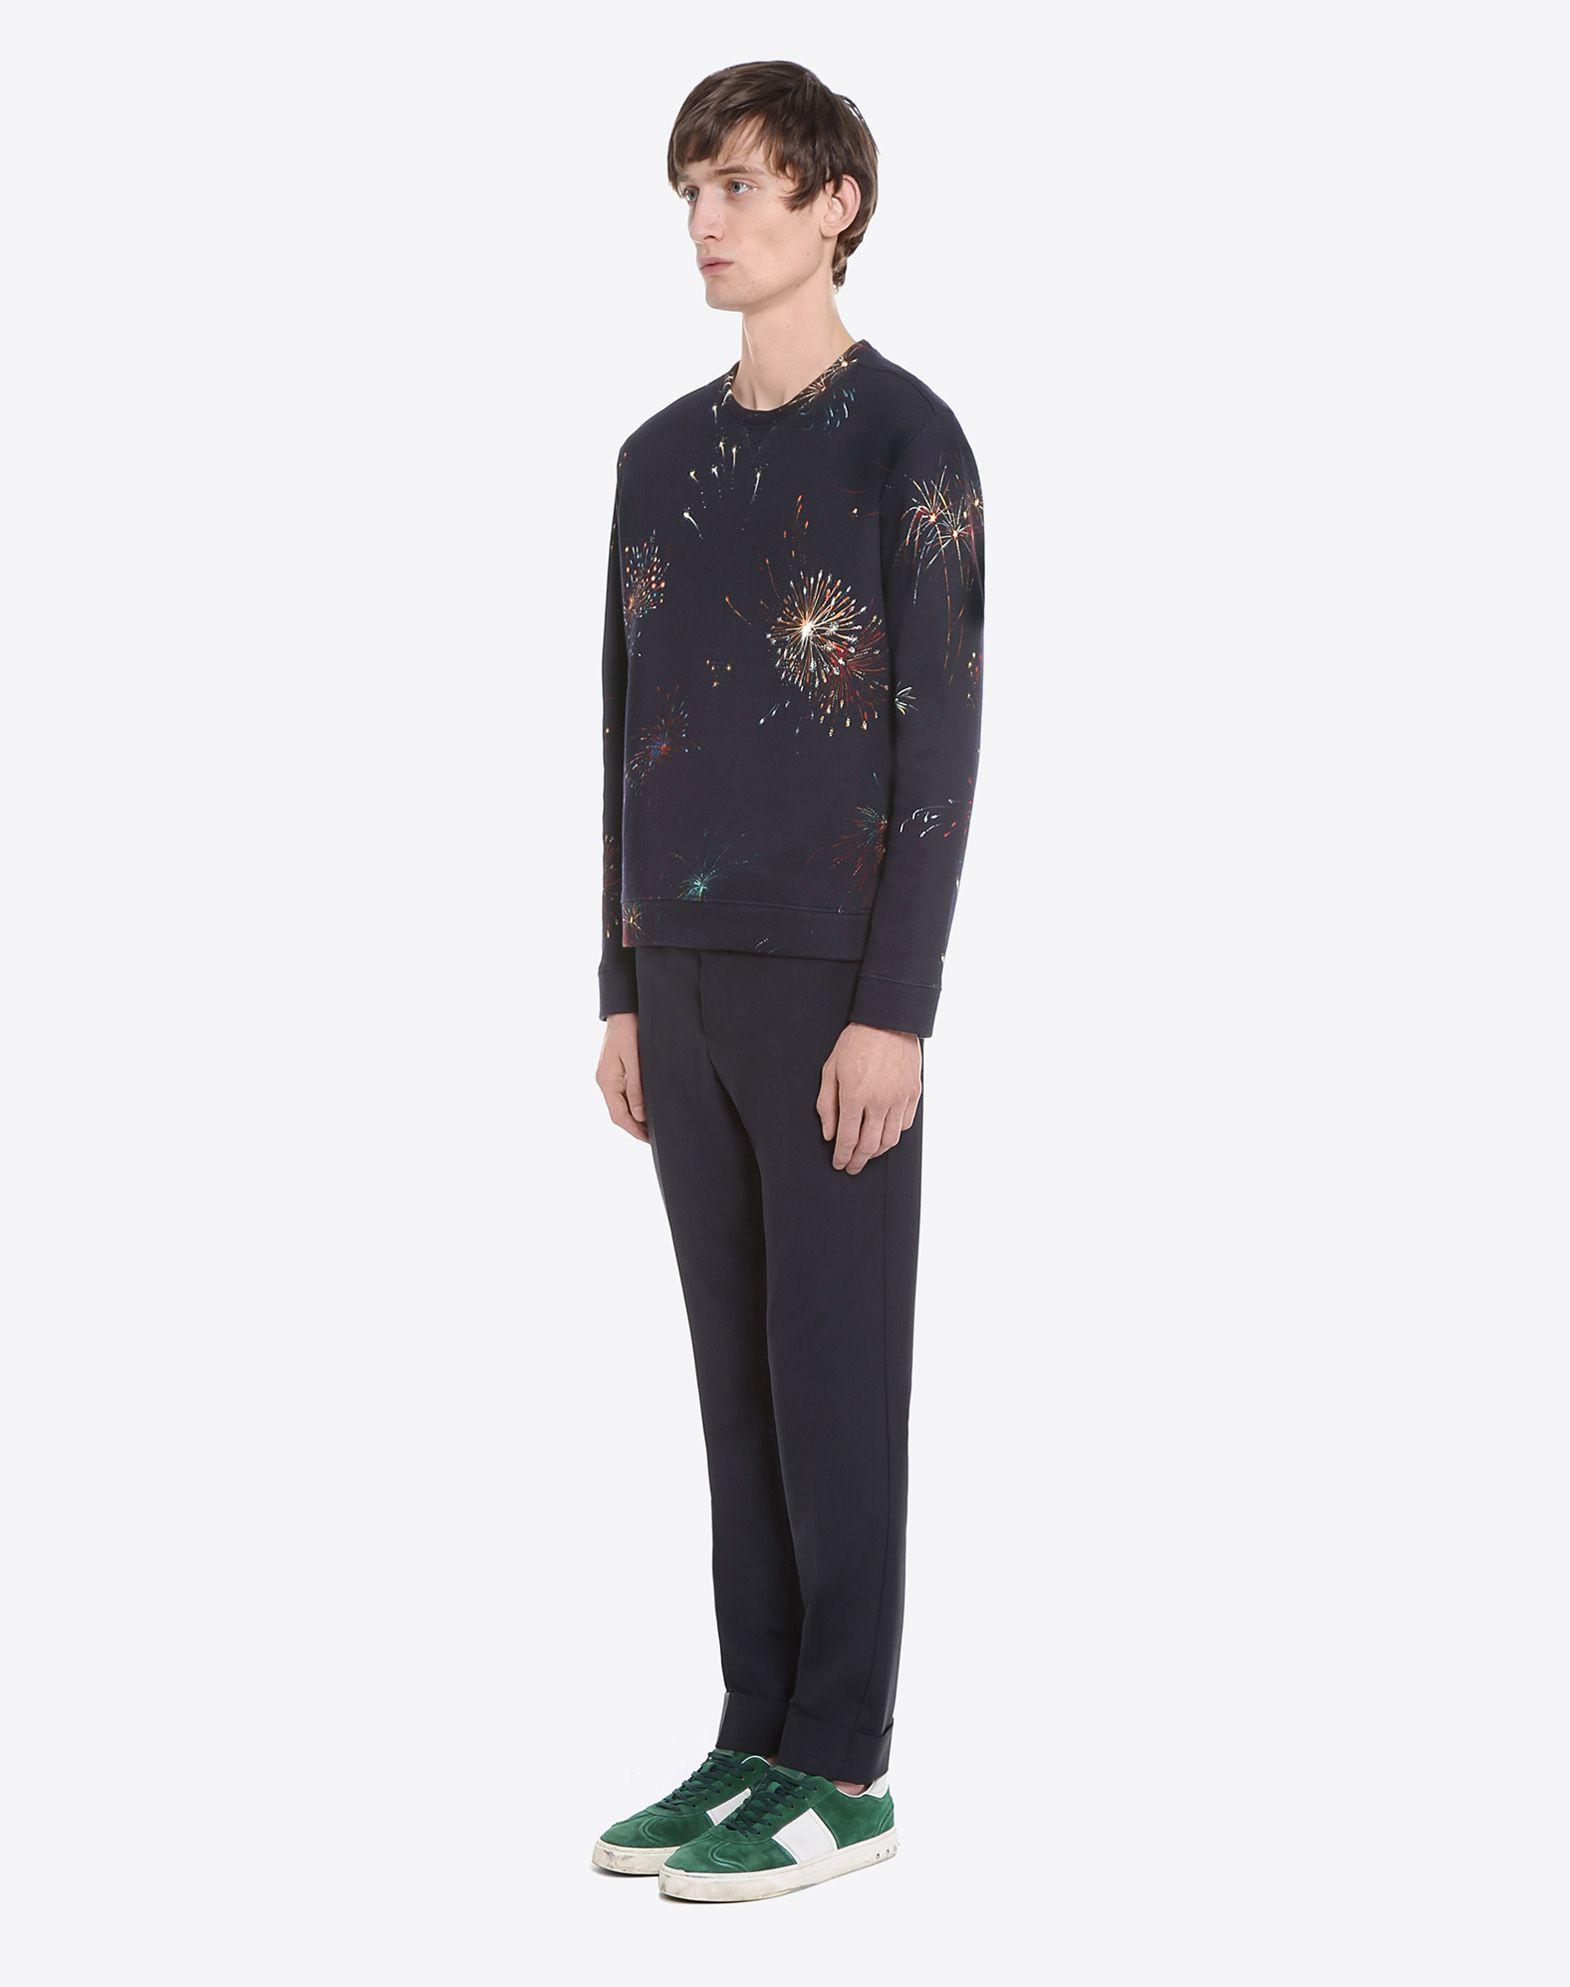 VALENTINO Studs Sweatshirt fleece Round collar Long sleeves  12026764qm